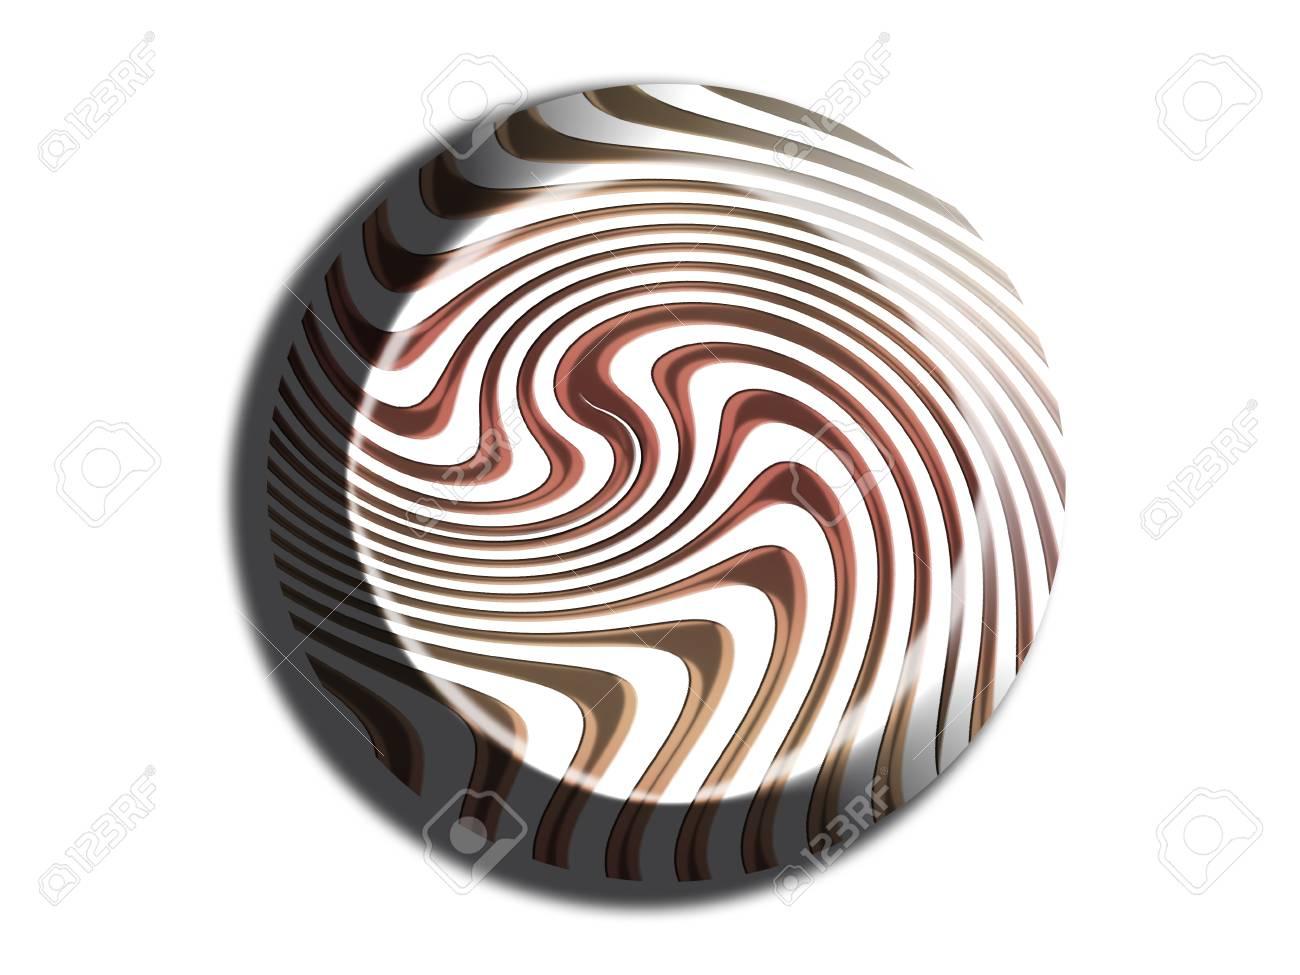 Striped bonbon chocolate 3d illustration on white Stock Illustration - 28819973